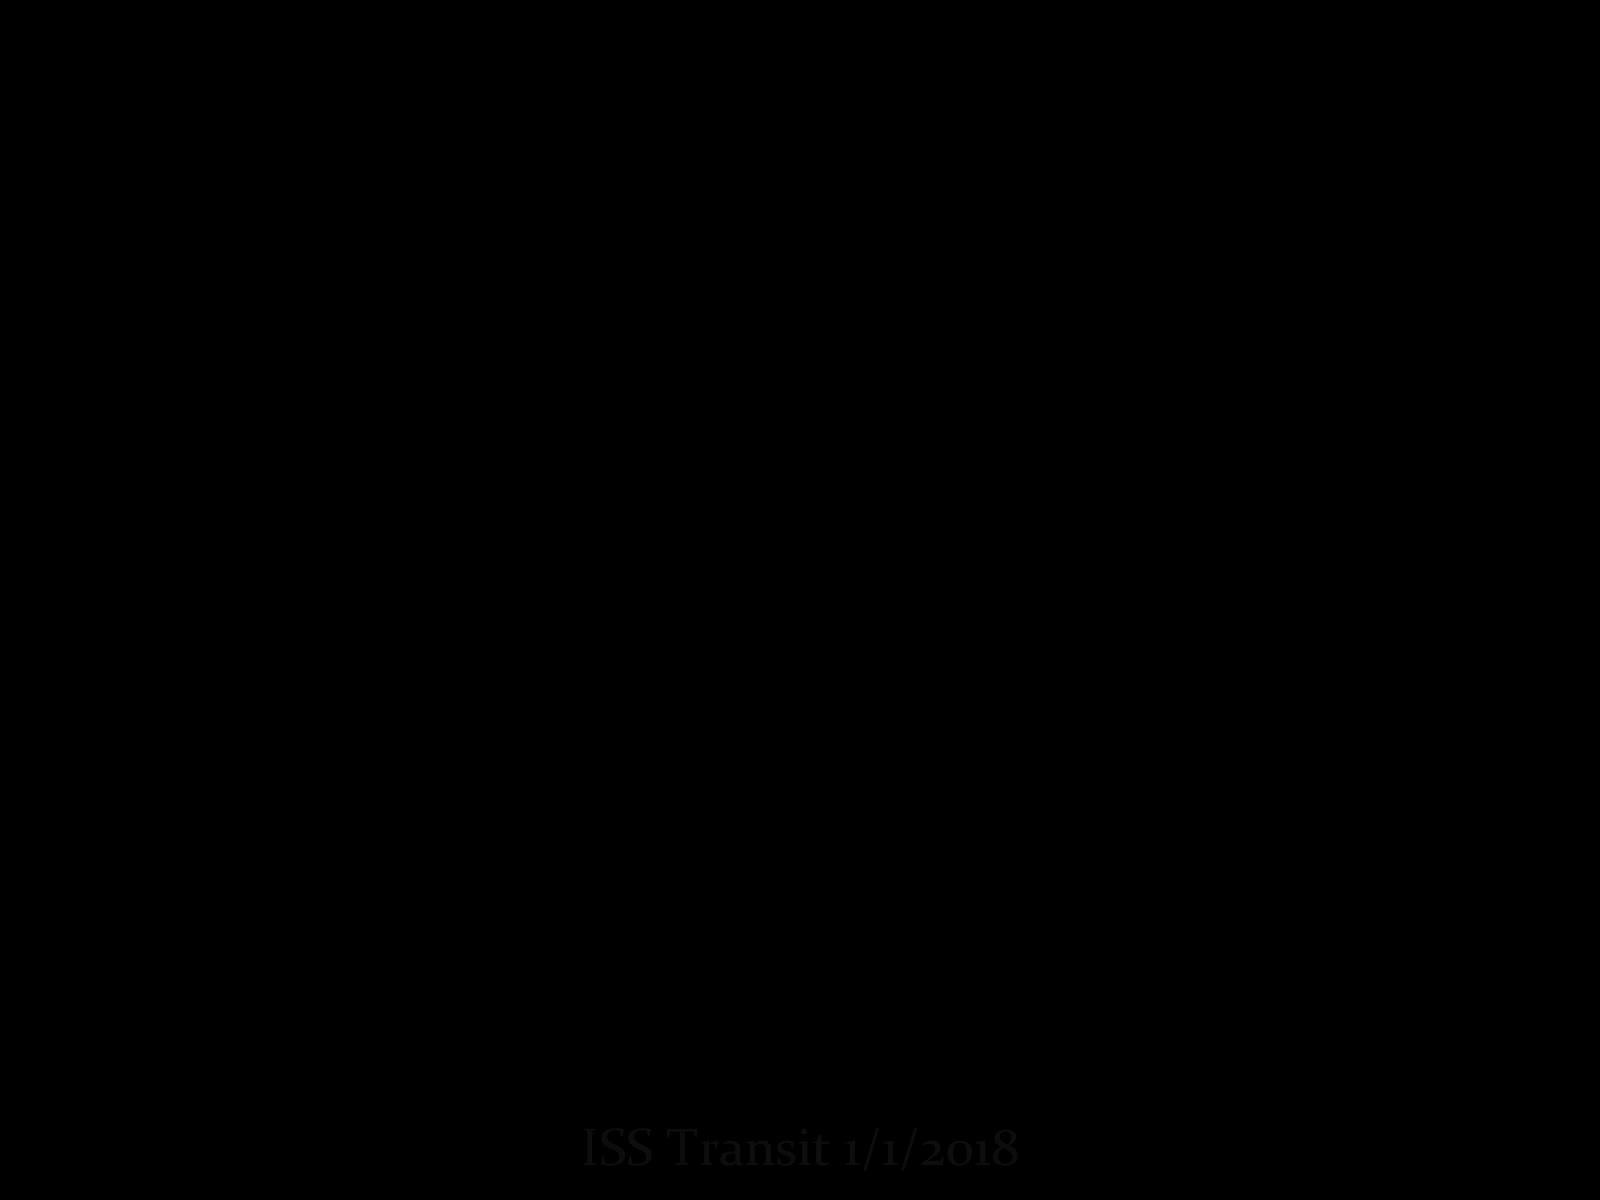 ISS Sun Transit 1/1/2018